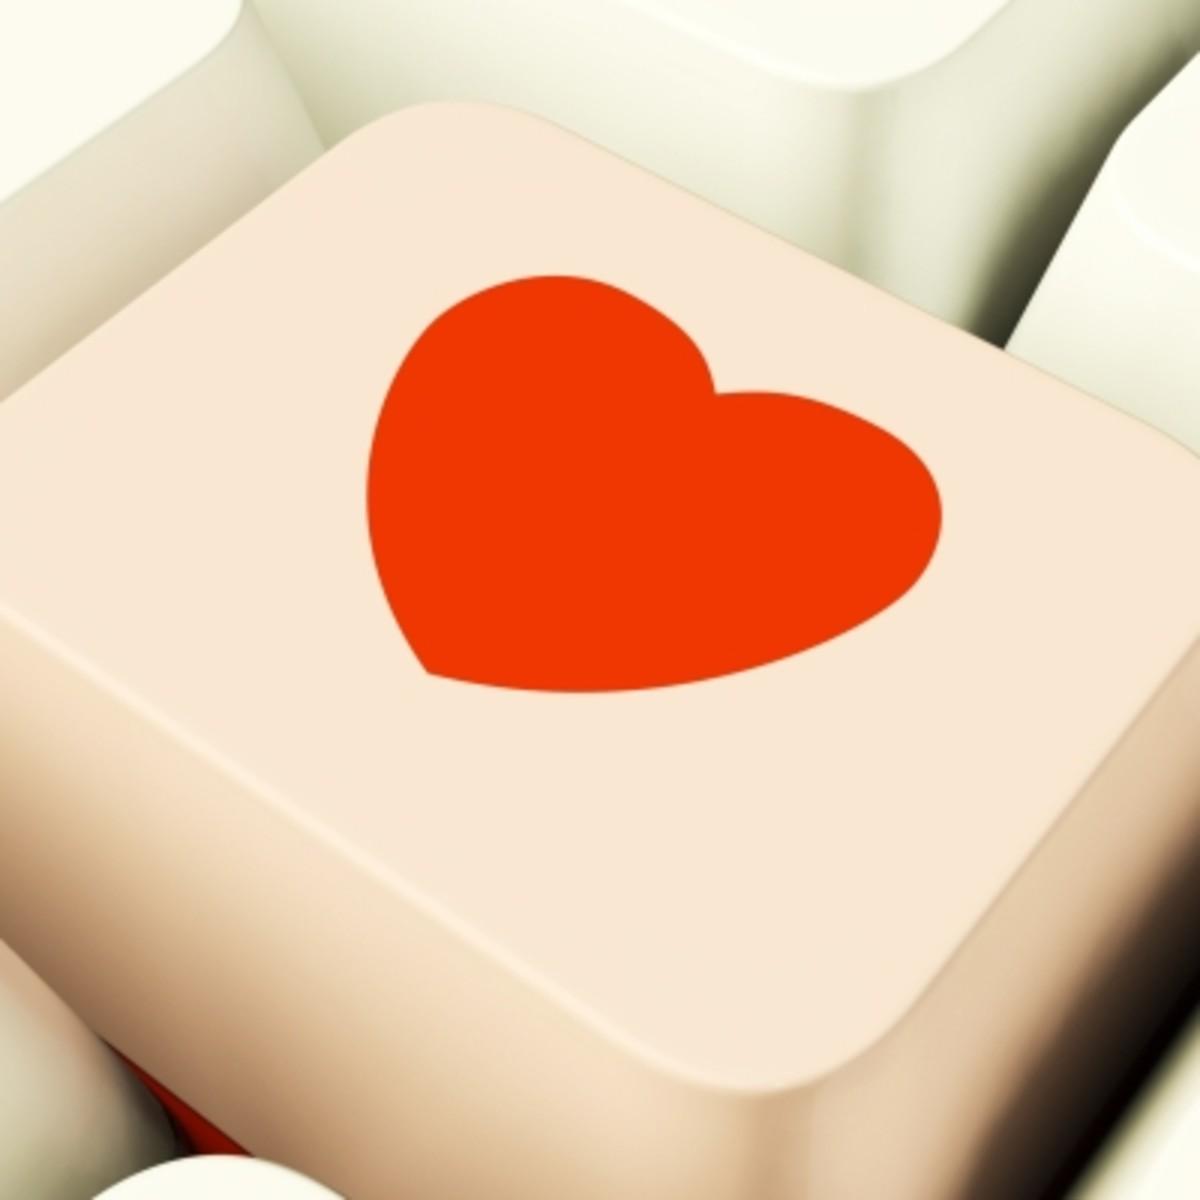 Heart on a Computer Key